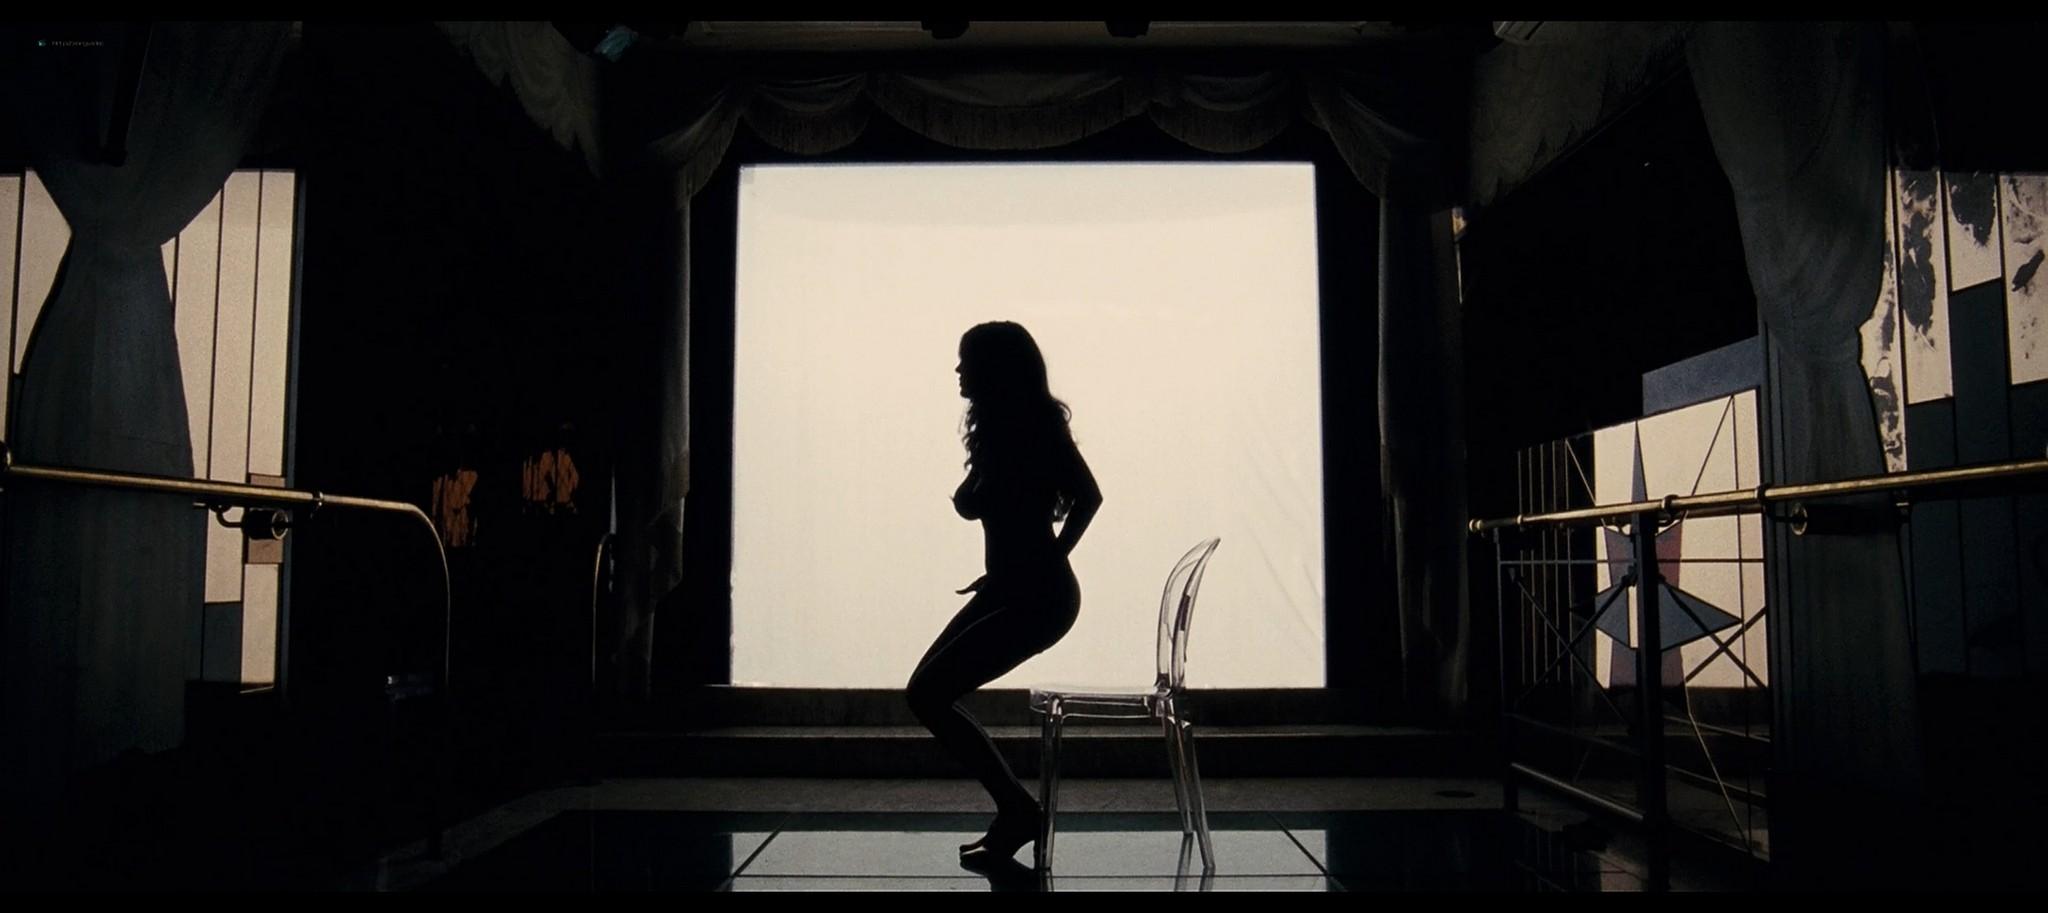 Sabrina Ferilli nude Anita Kravos full frontal Galatea Ranzi and others nude and sexy The Great Beauty IT 2013 1080p BluRey 13